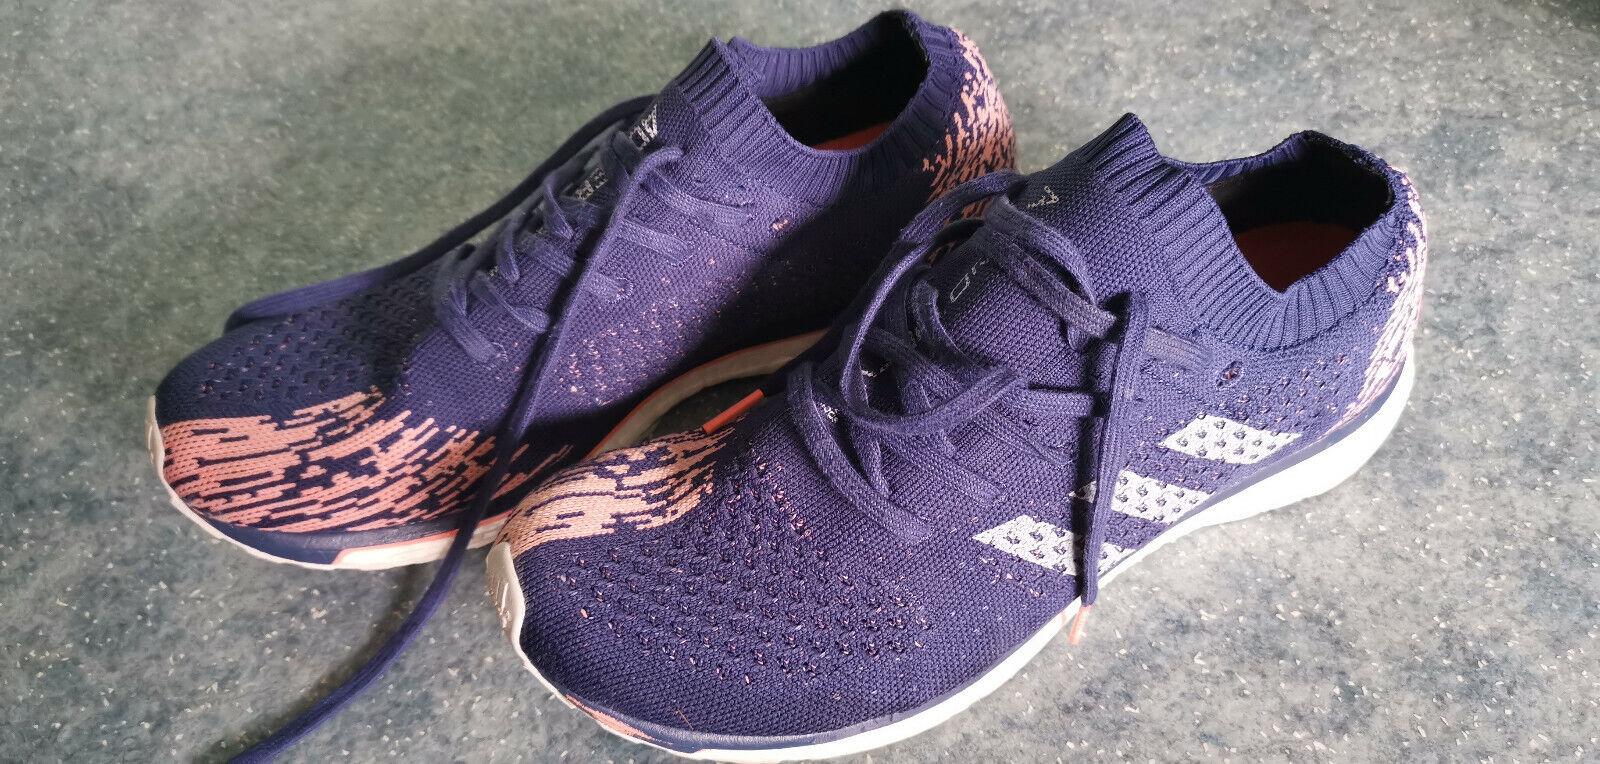 Adidas prime adizero boost LTD Performance EU44-US10-UK9.5 perfect condition